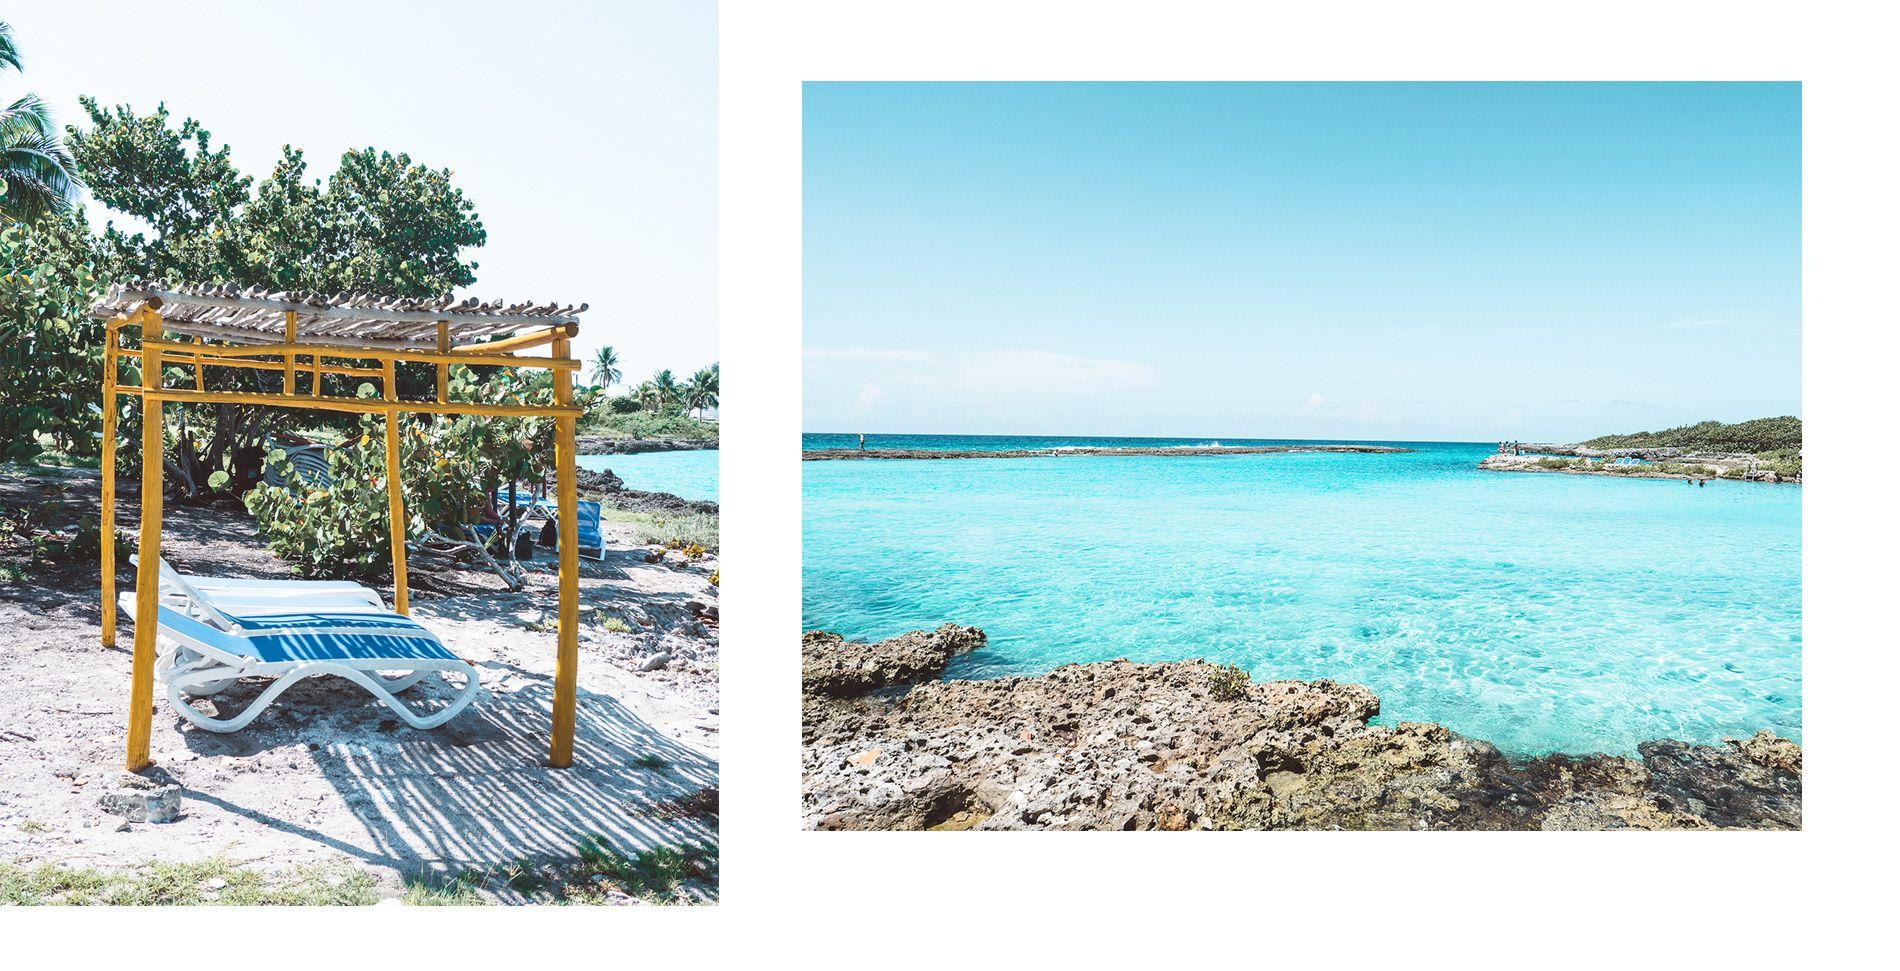 Cuba | carte | cienaga de zapata | playa larga